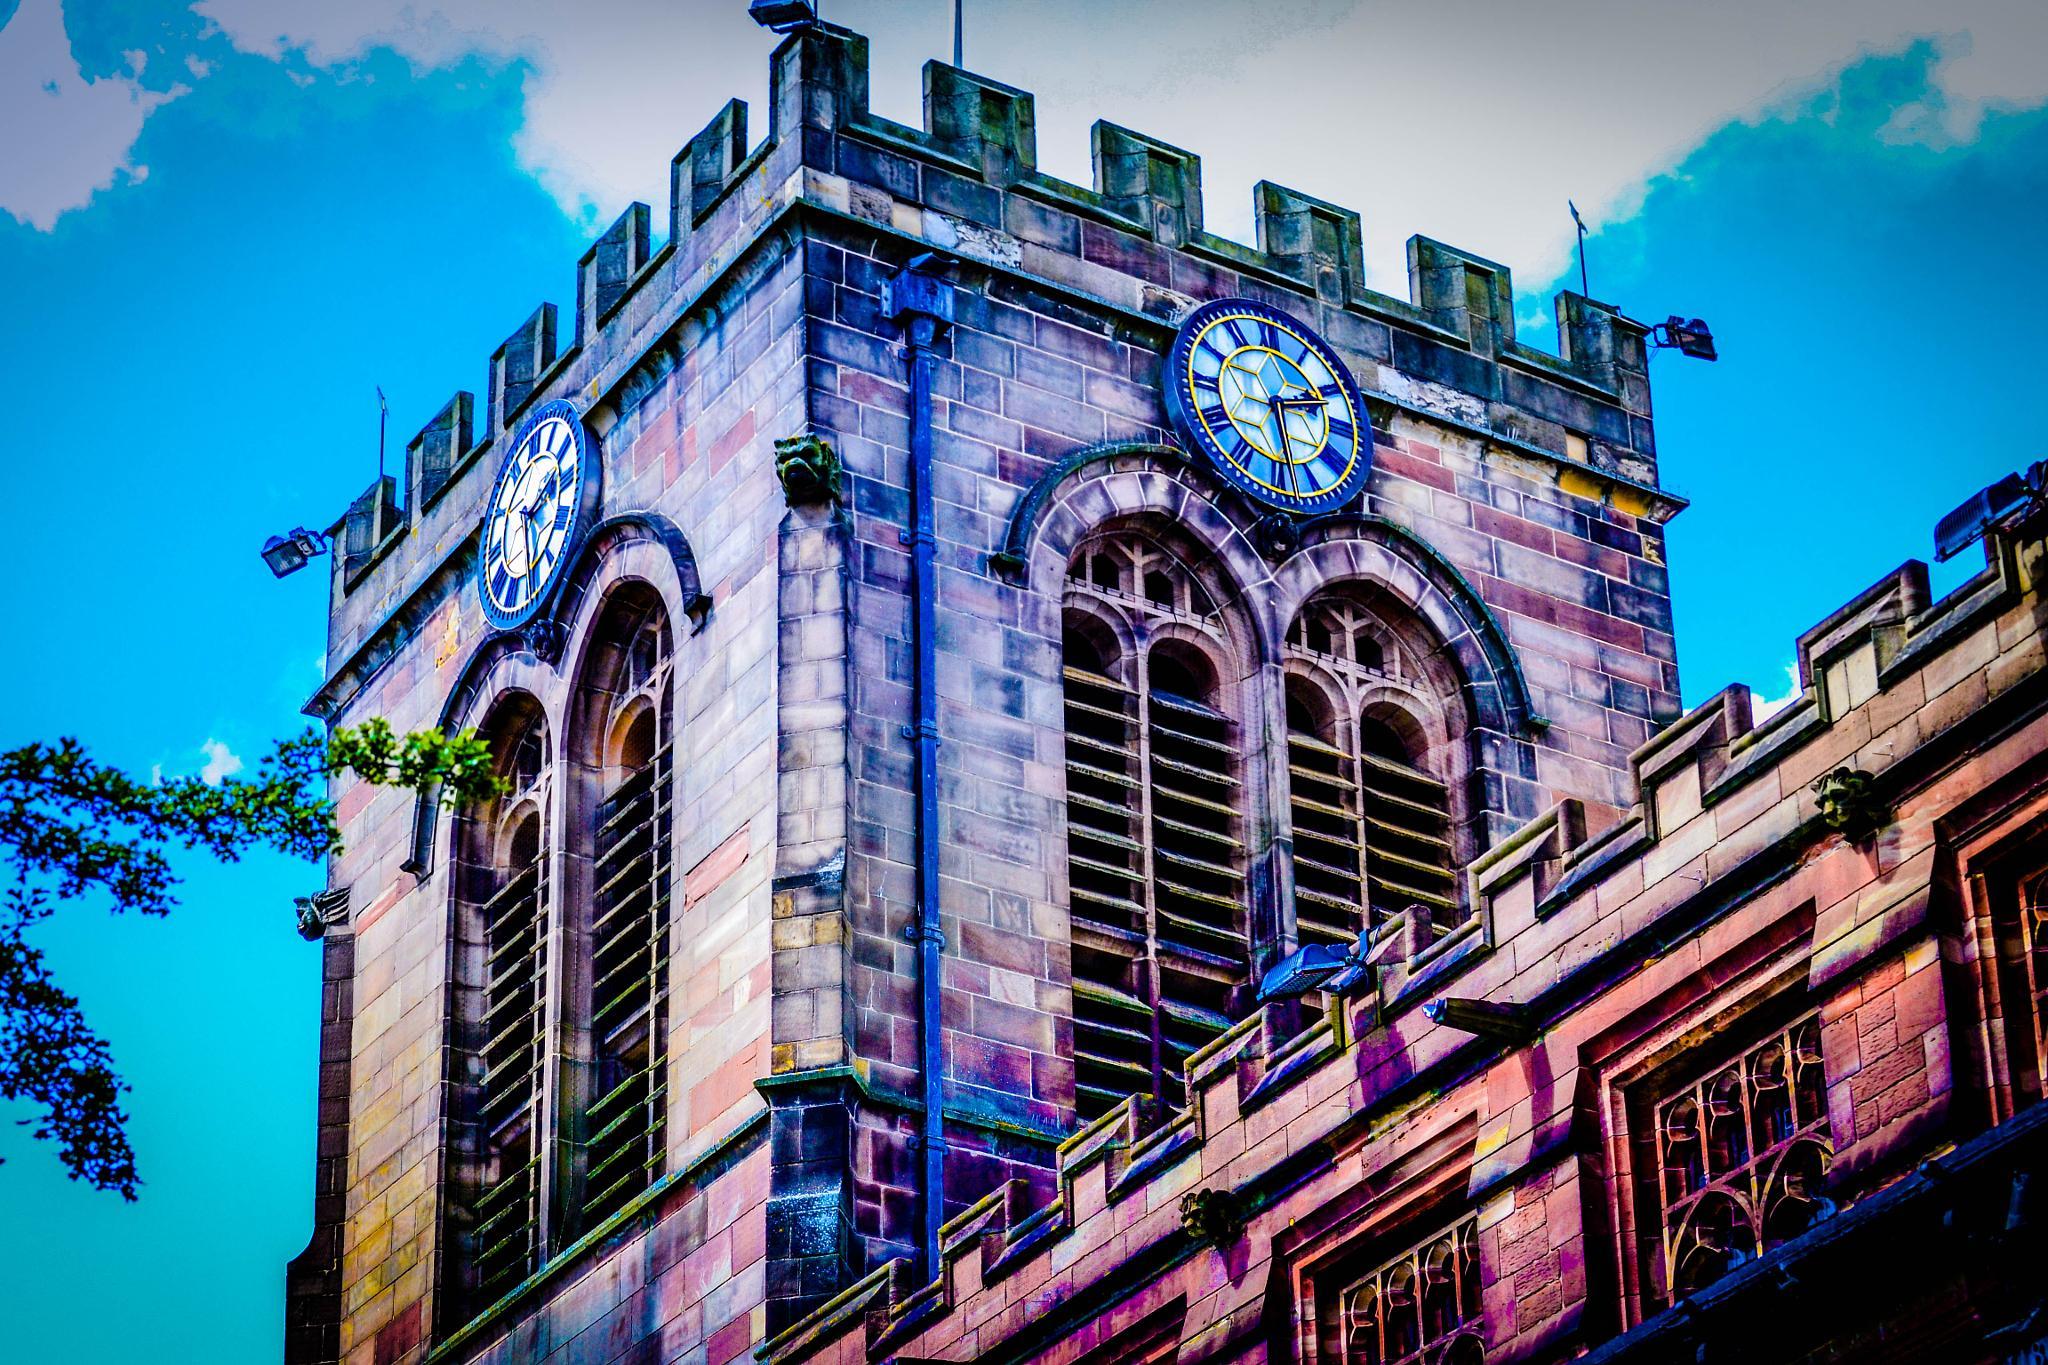 Leigh Parish Church Tower by Darren Green